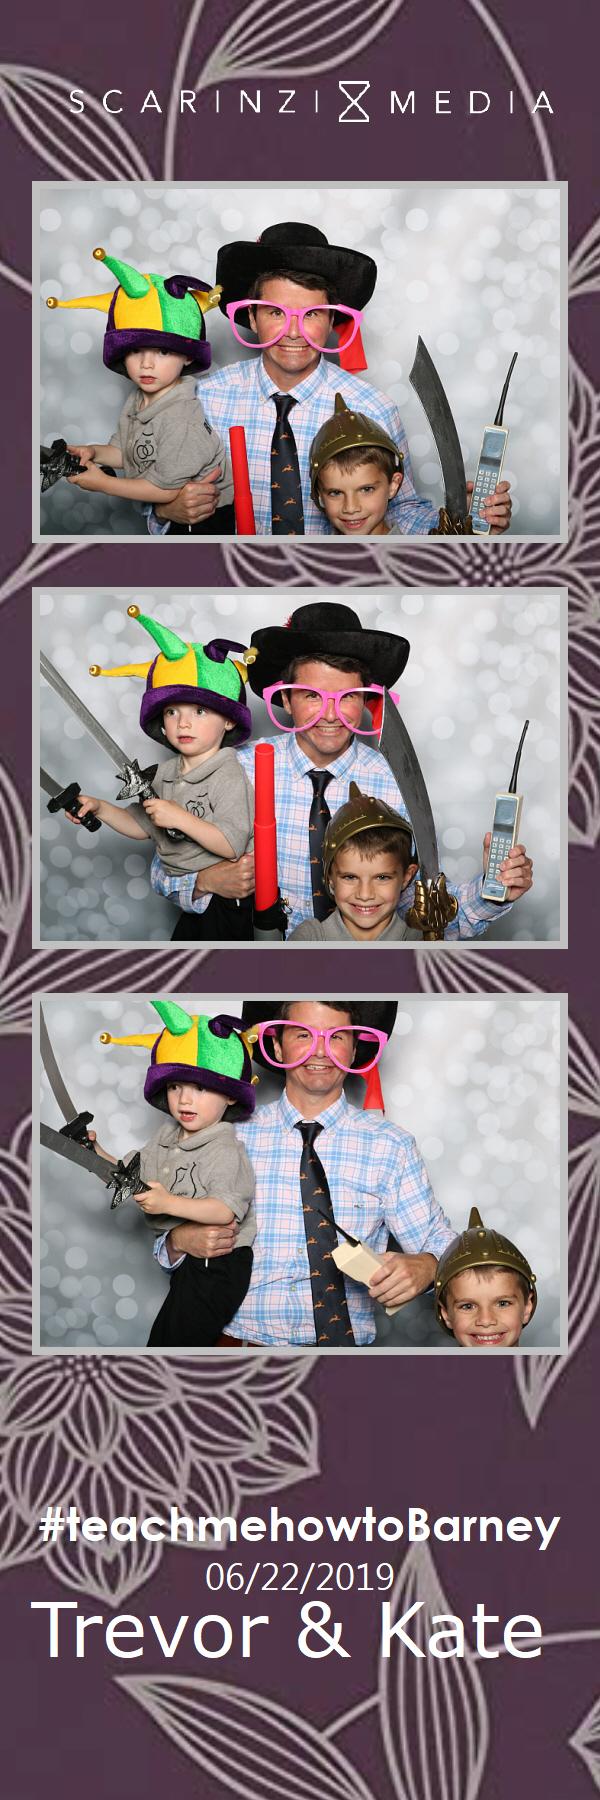 2019.06.22 - Barney Wedding PHOTOBOOTH29.jpg